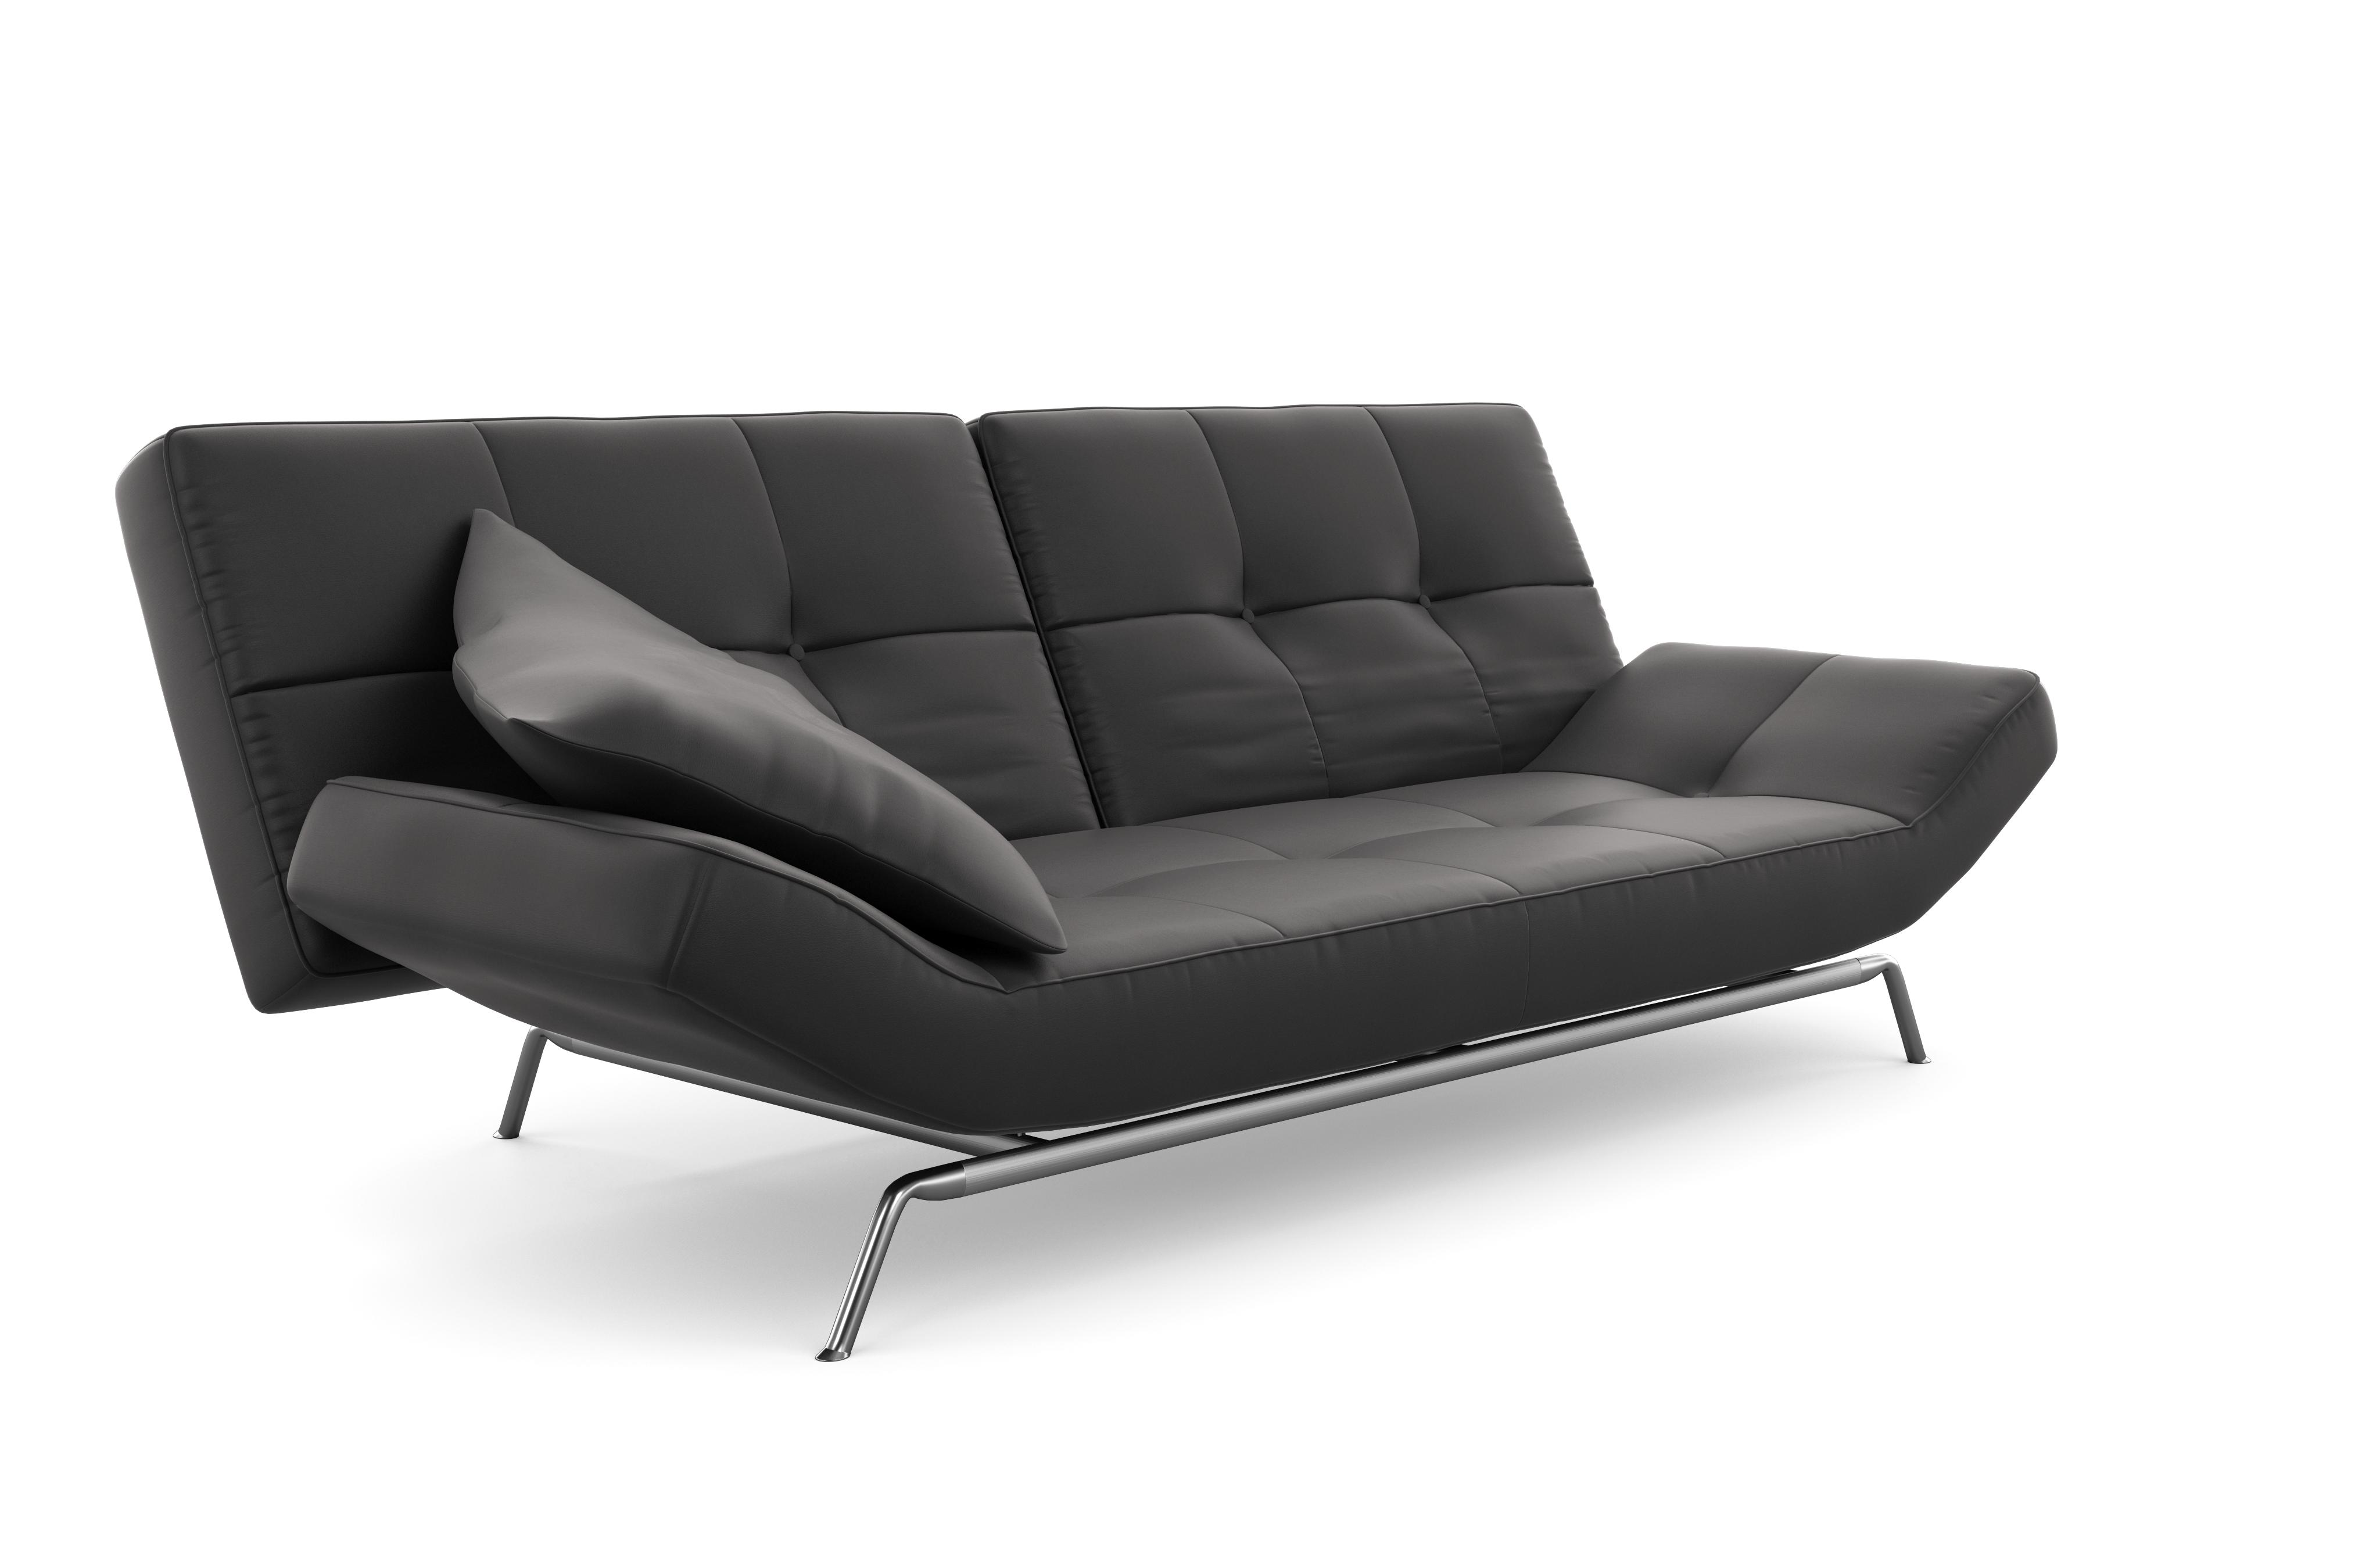 Smala Ligne Roset Sofa Bed Furniture Blue Leather Sofa Couch